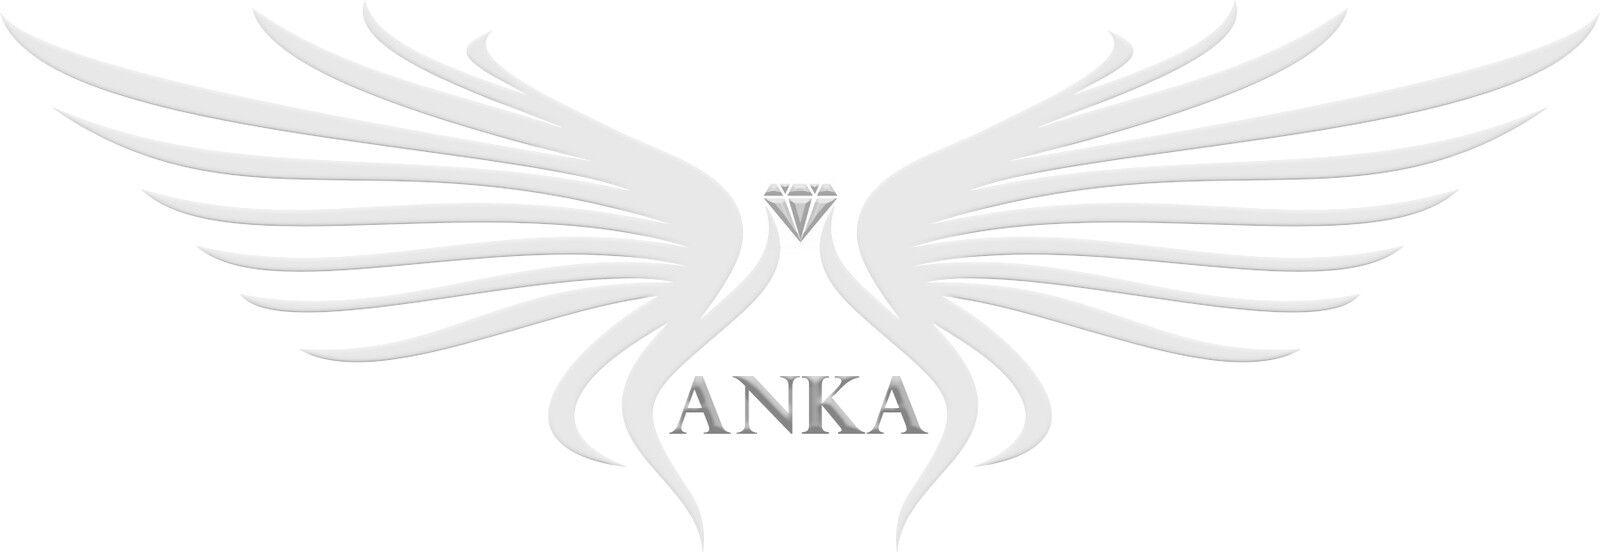 Anka Shop